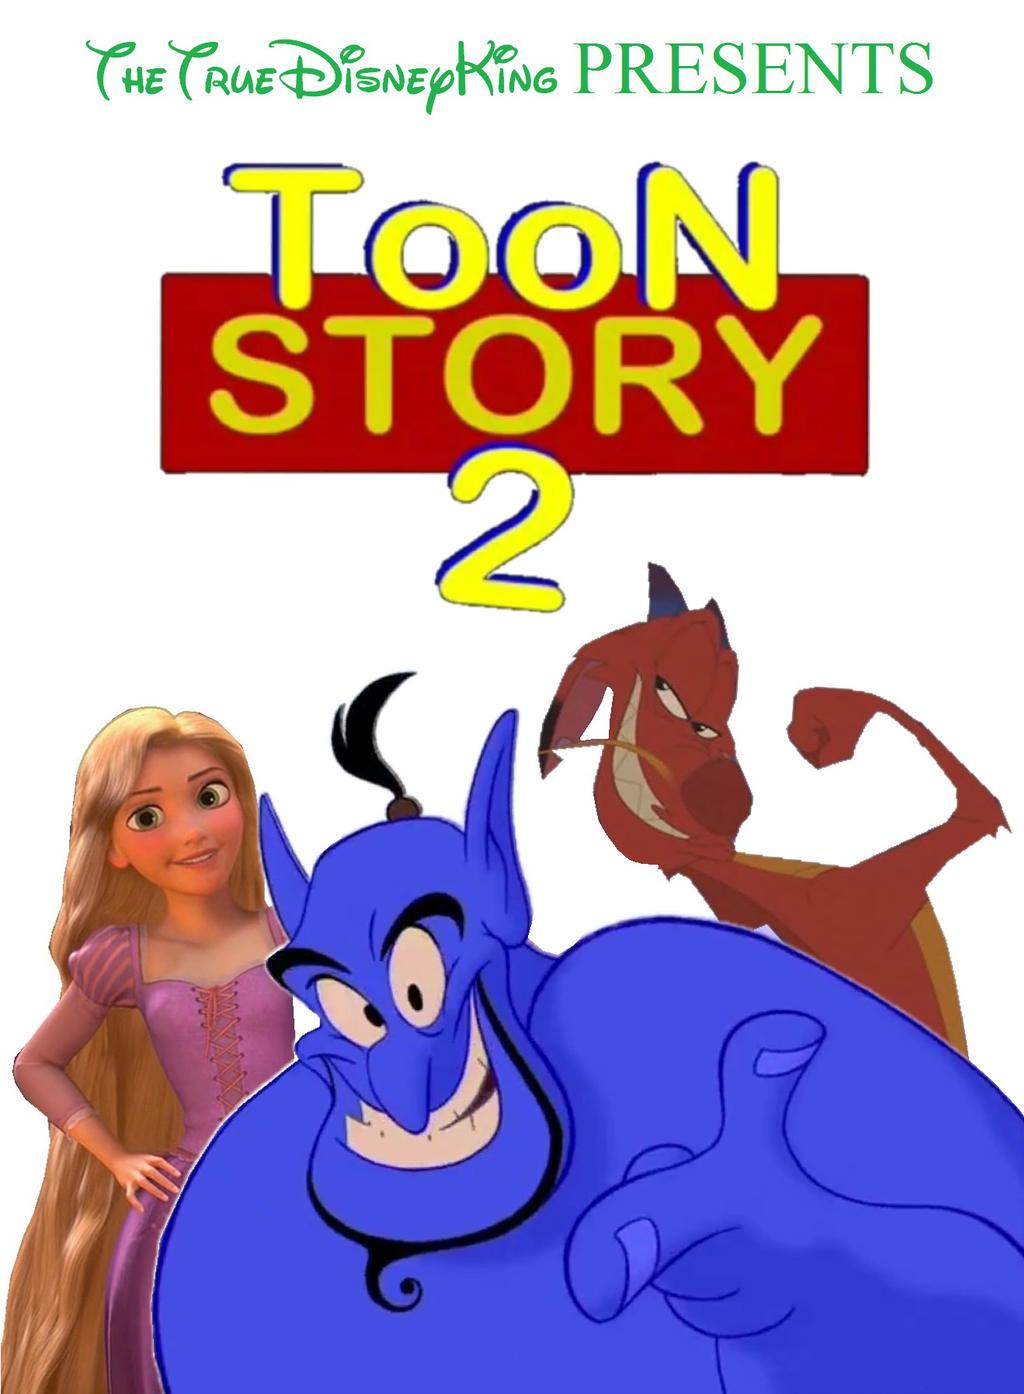 Toon Story 2 (TheTrueDisneyKing Style)